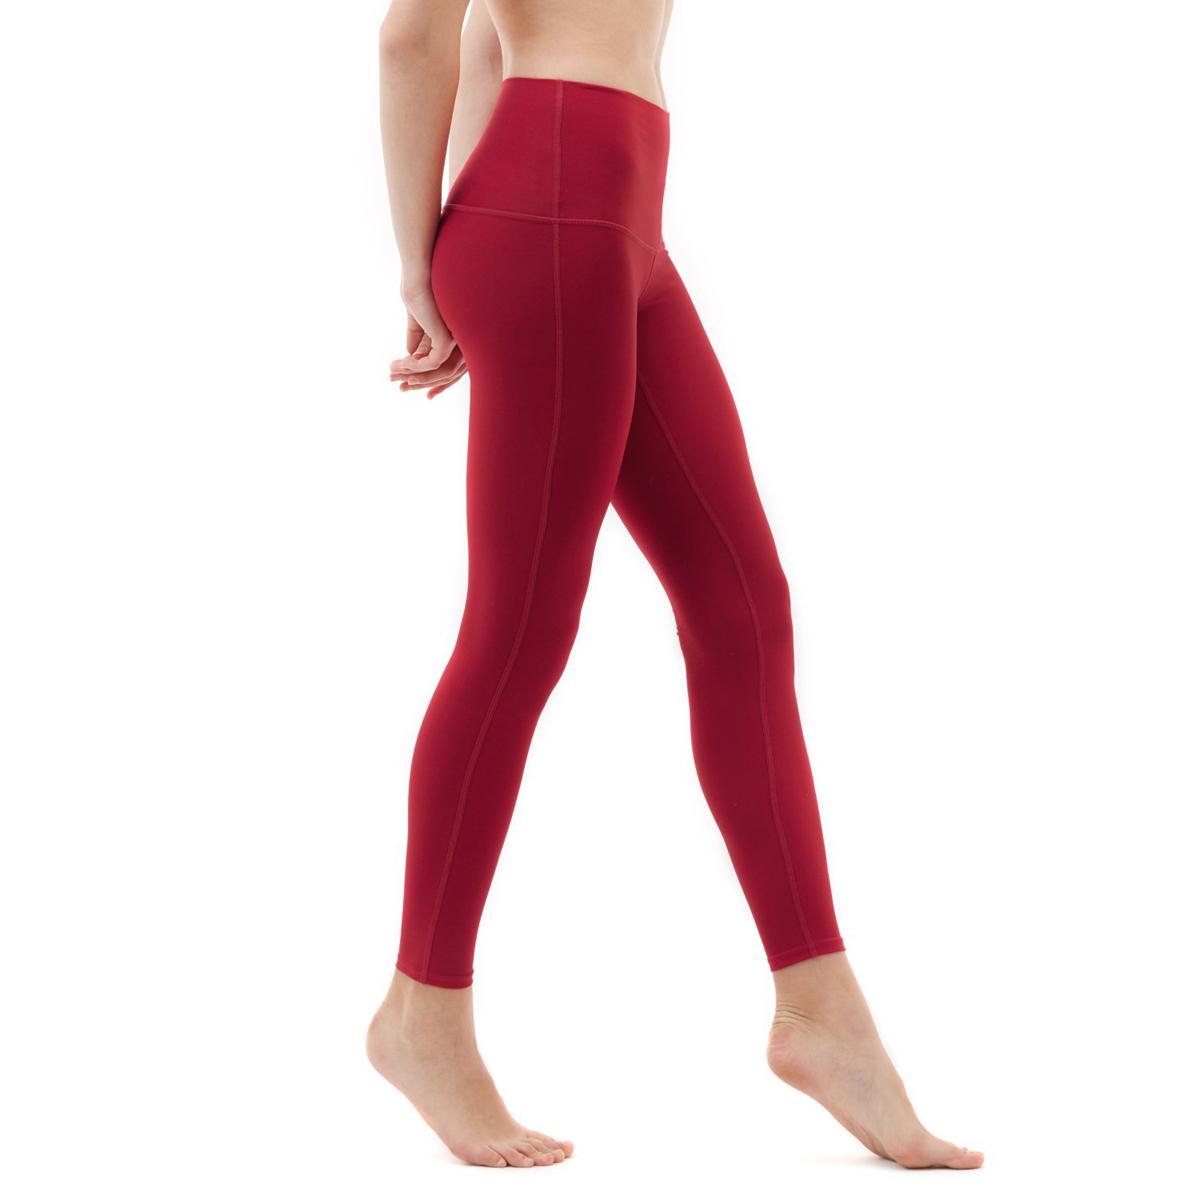 thumbnail 71 - TSLA Tesla FYP42 Women's High-Waisted Ultra-Stretch Tummy Control Yoga Pants